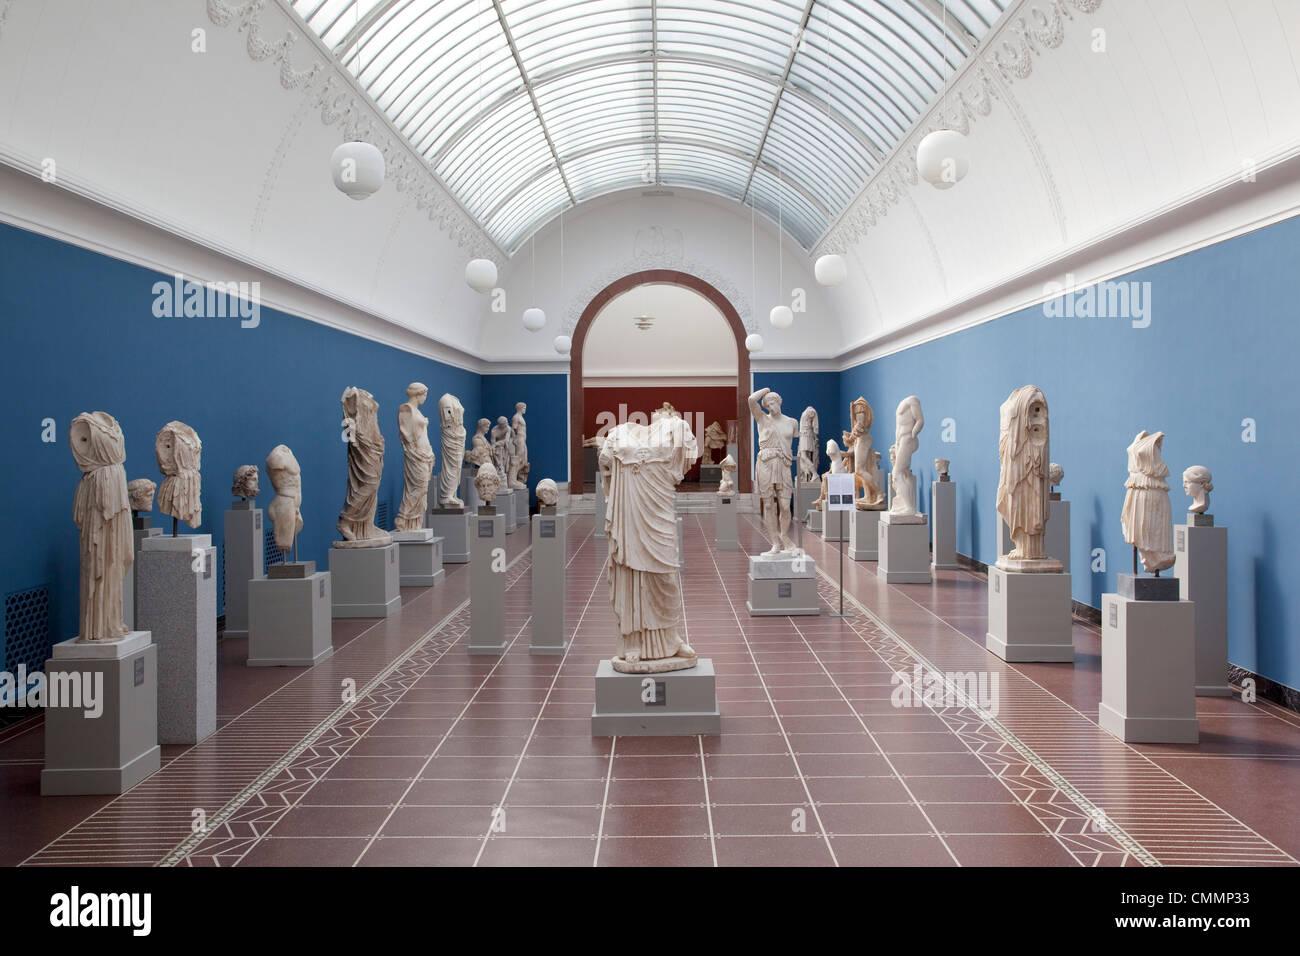 L'intérieur, NY Carlesberg Glyptotek Art Museum, Copenhague, Danemark, Scandinavie, Europe Banque D'Images